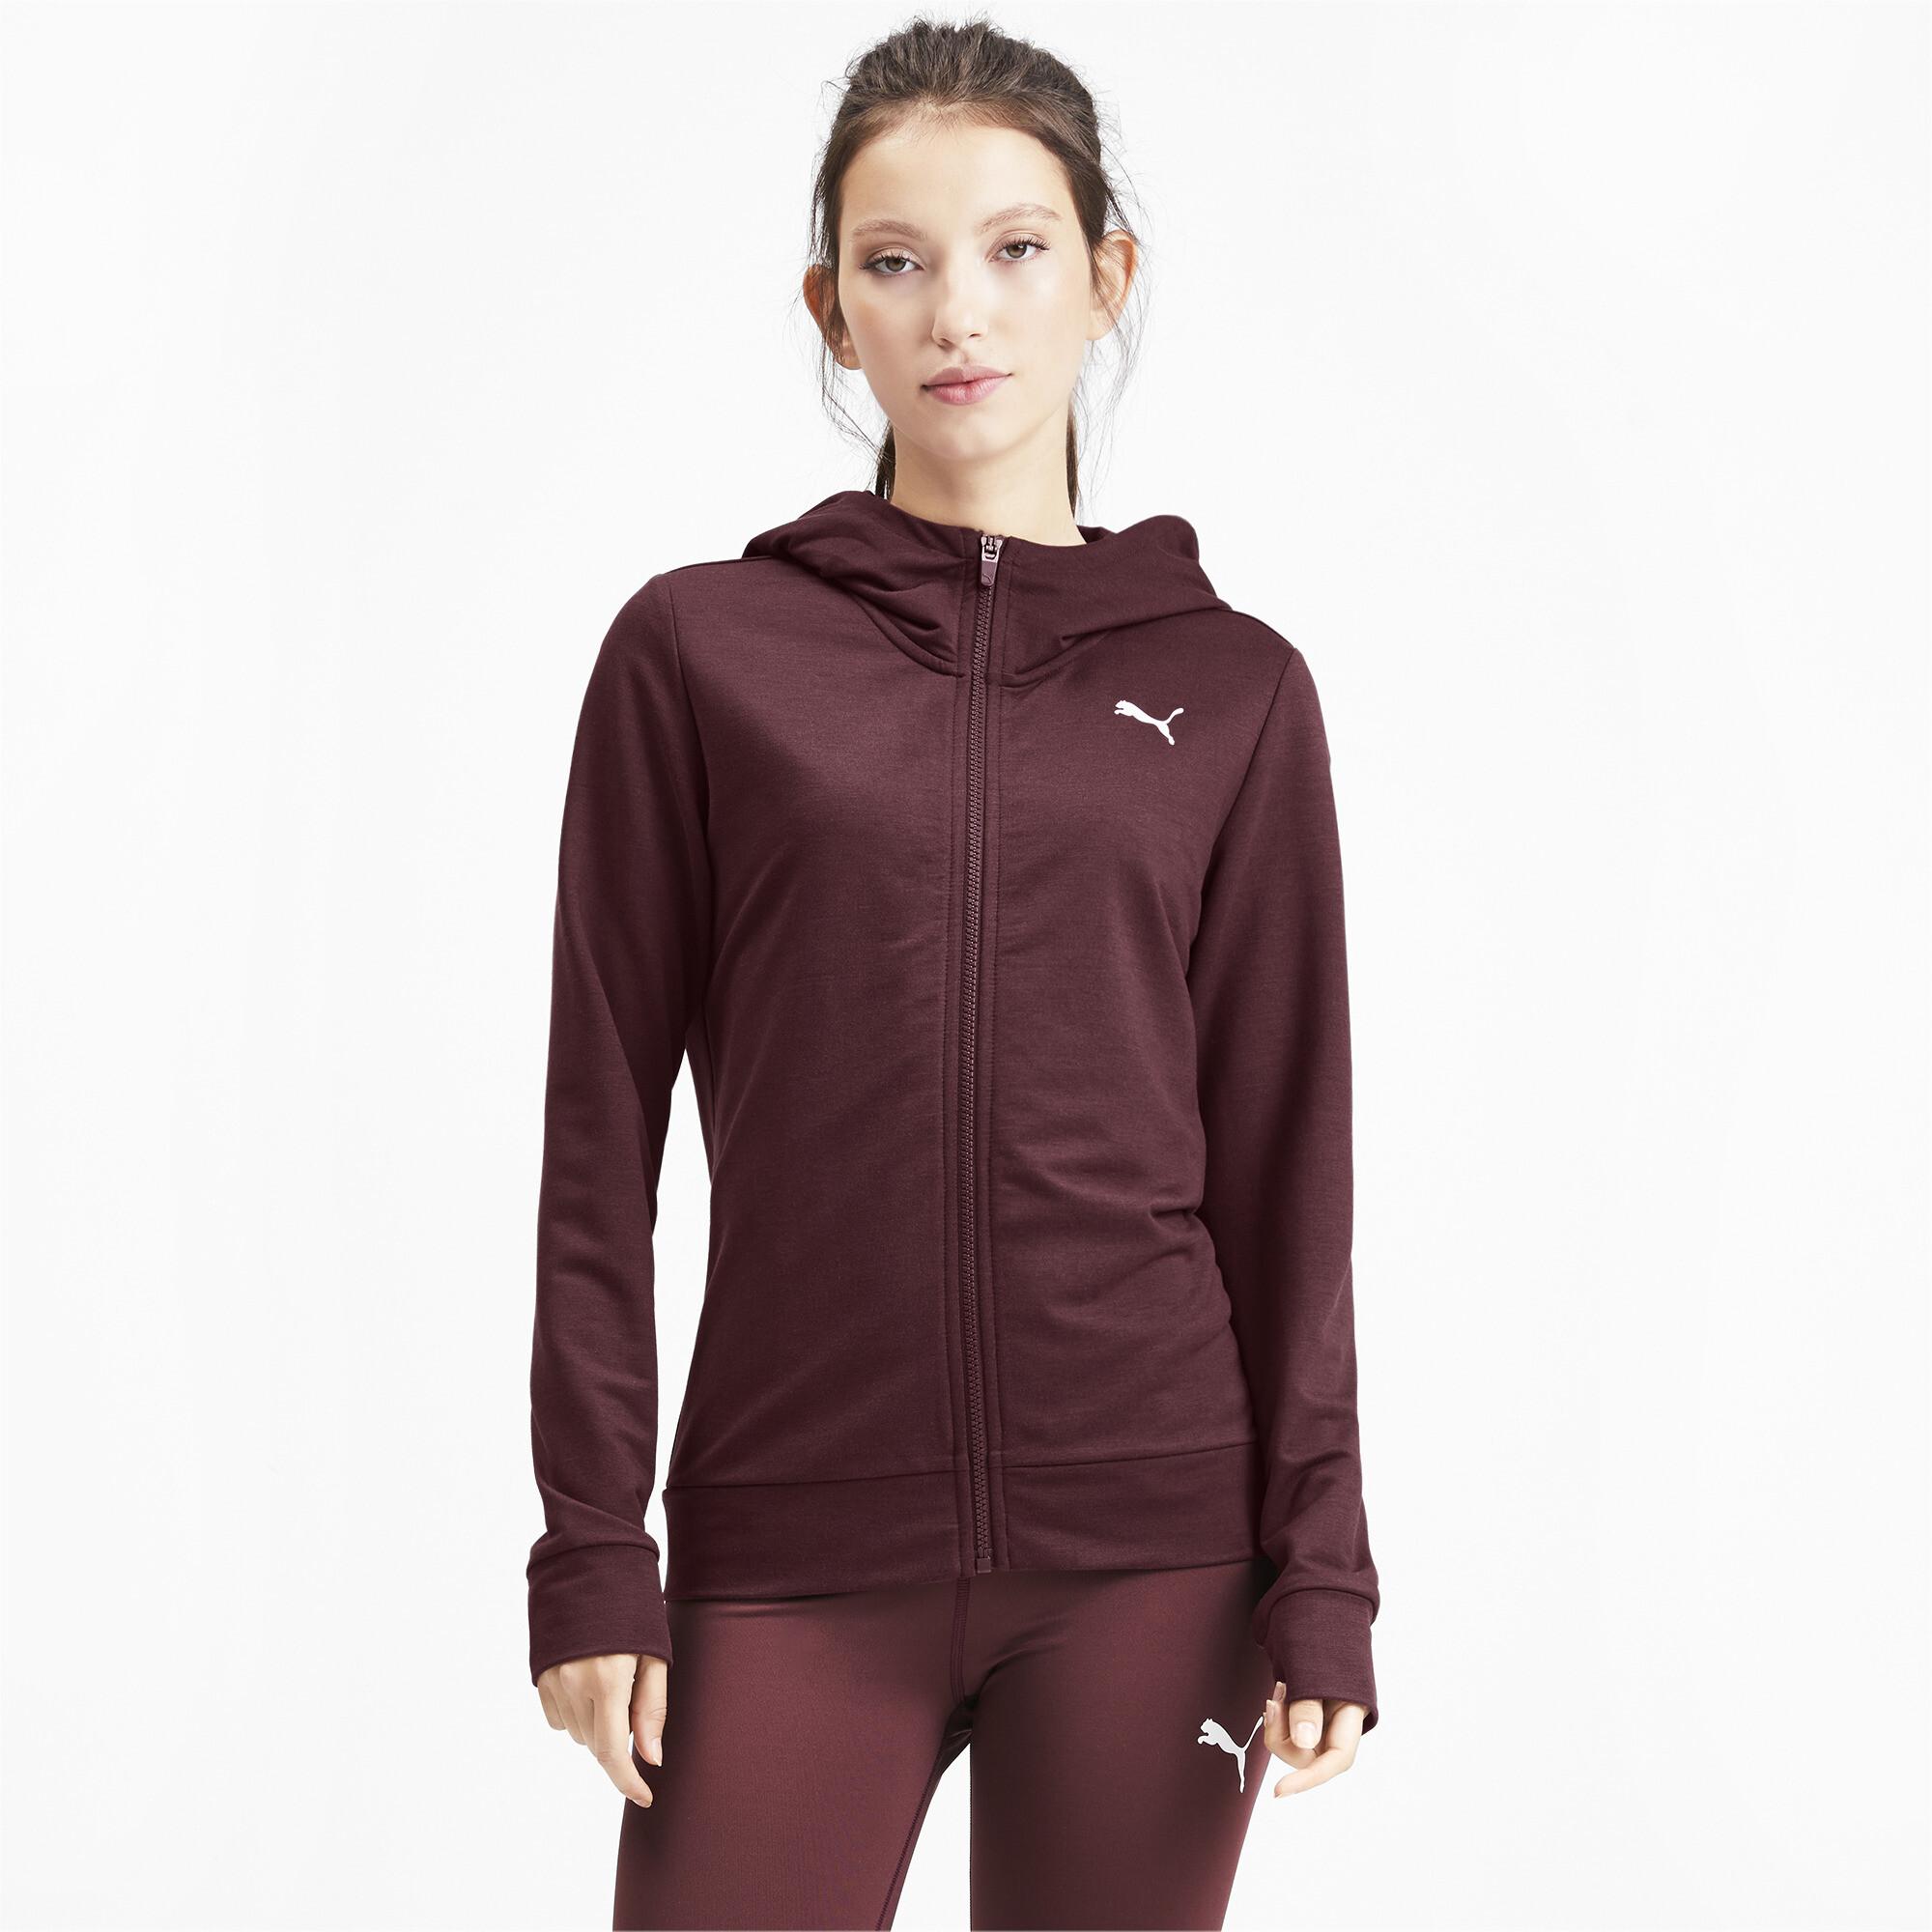 PUMA-Women-039-s-Modern-Sports-Full-Zip-Logo-Hoodie thumbnail 9